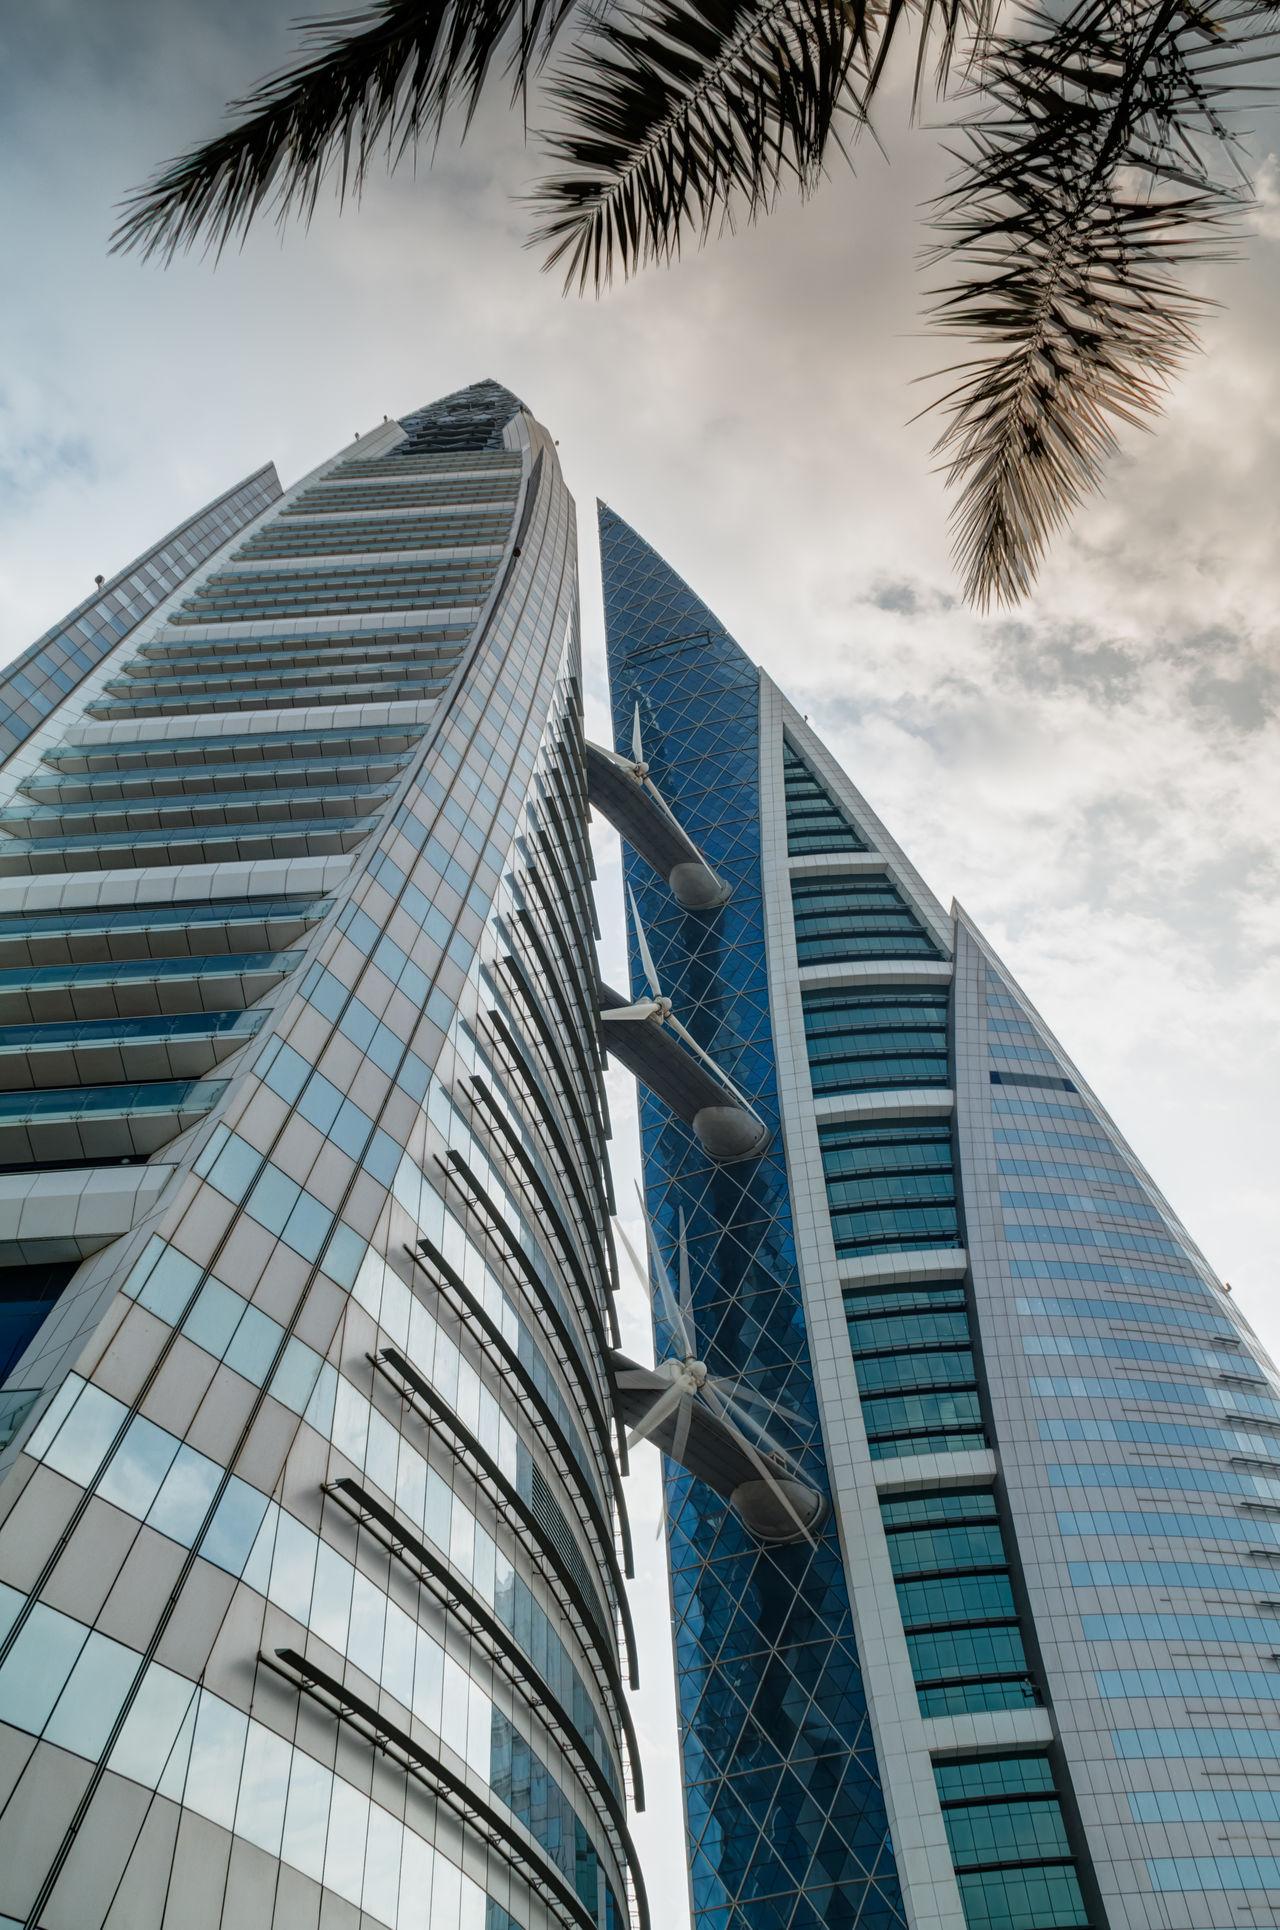 Architechture Kingdom Of Bahrain Relegion Skycrapers Travel Traveling